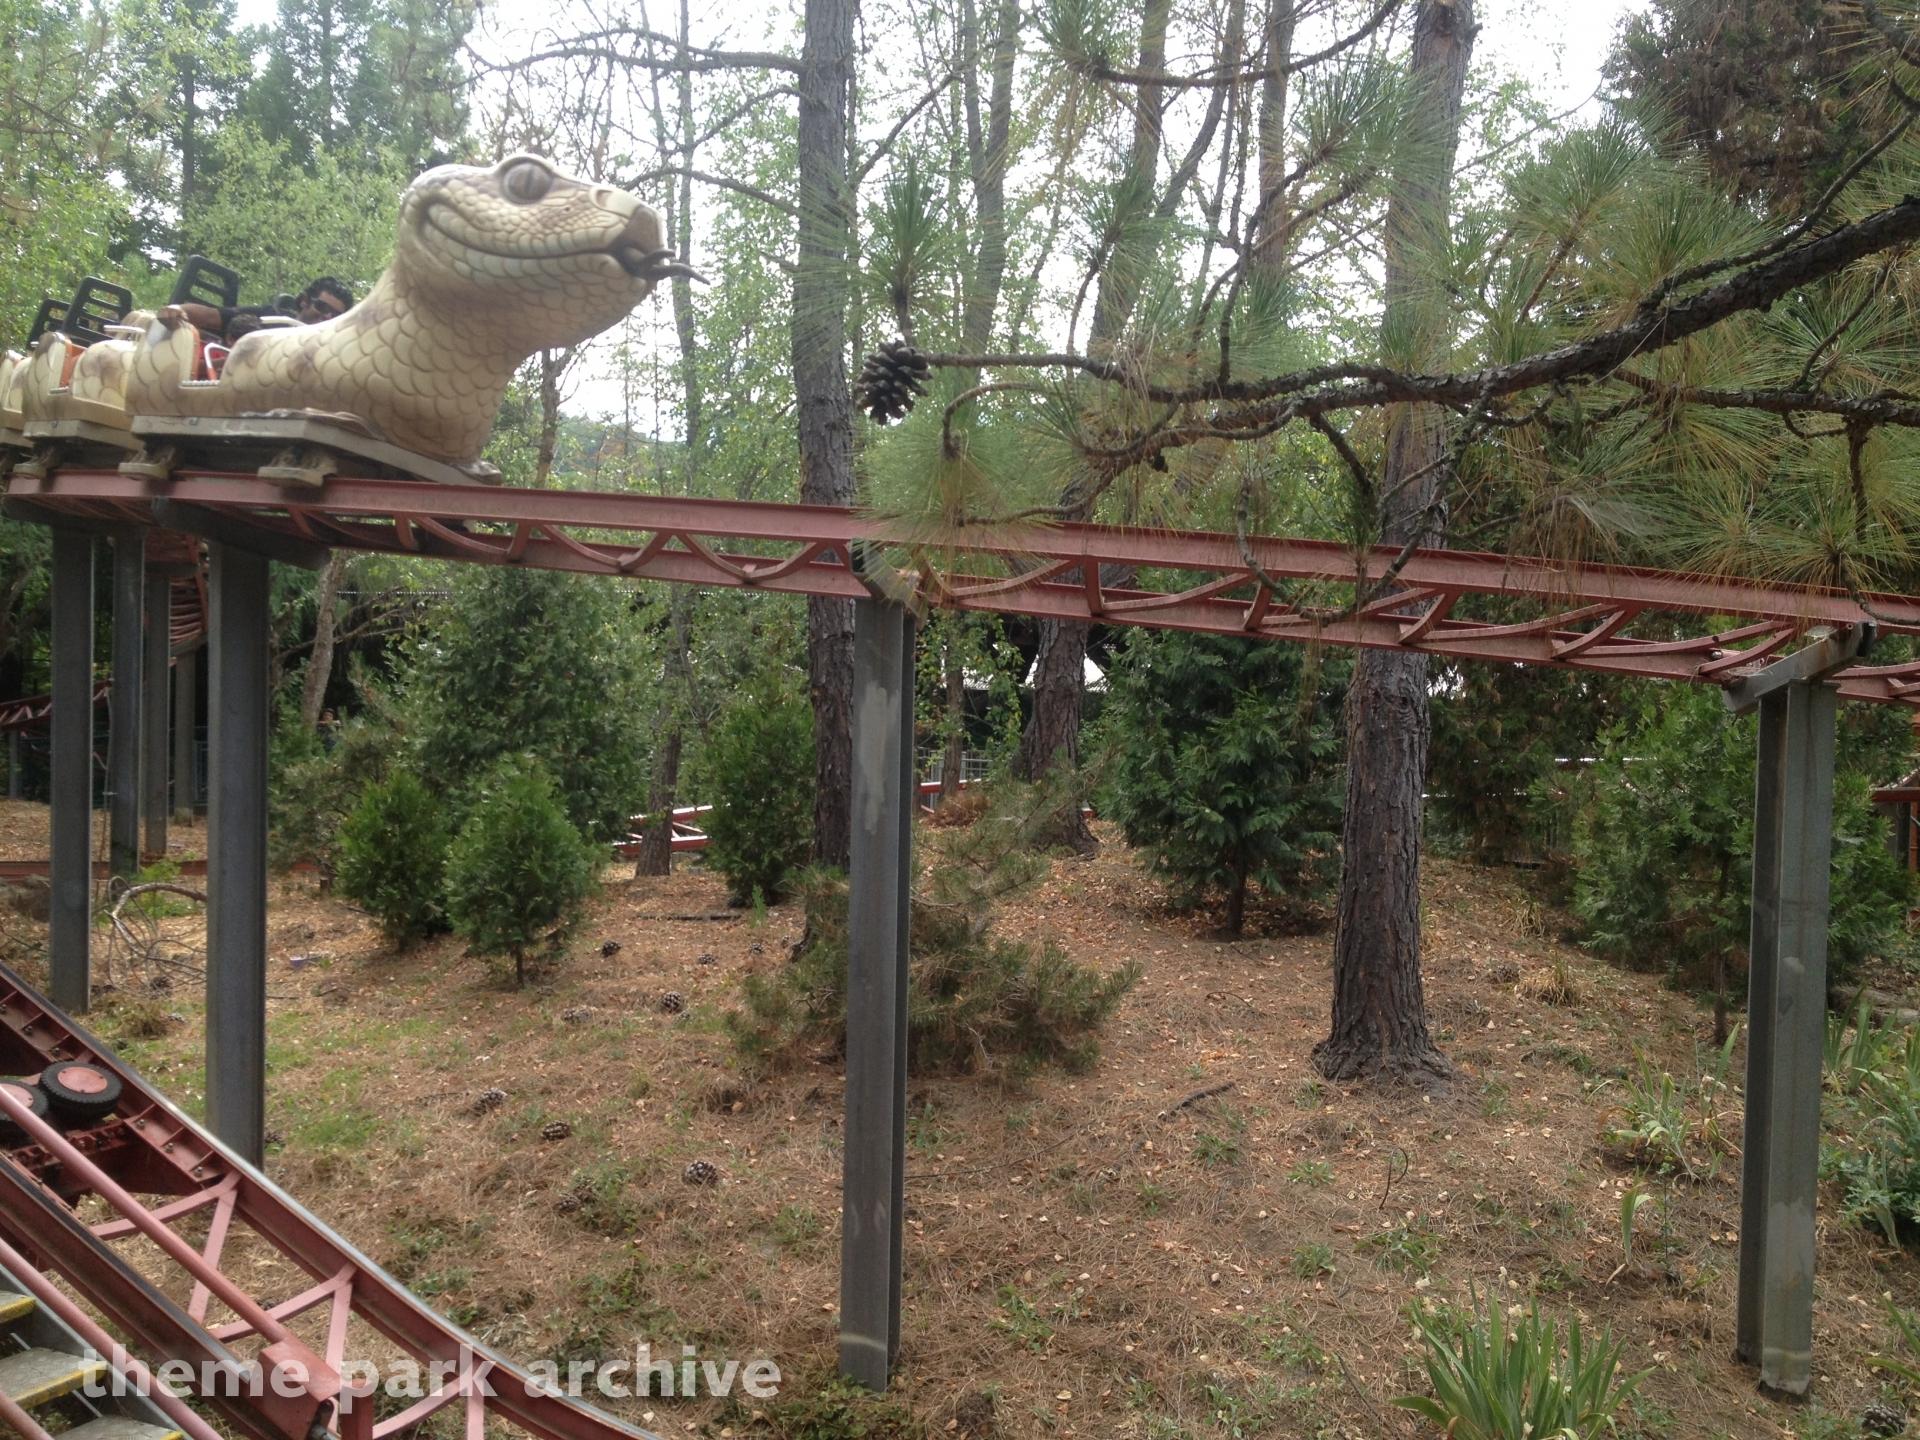 Gilroy Gardens 2013 | Theme Park Archive